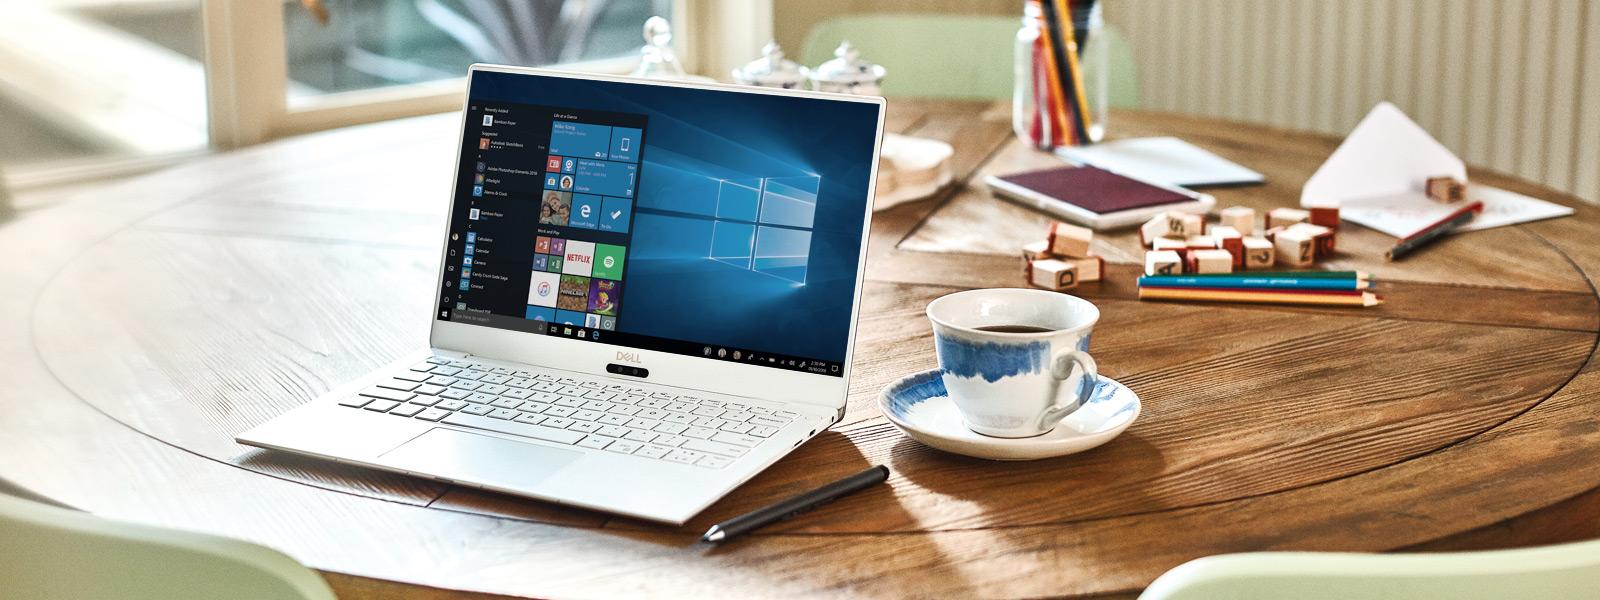 Dell XPS 13 9370 otvoren je na stolu i na njemu je prikazan početni zaslon sustava Windows 10.